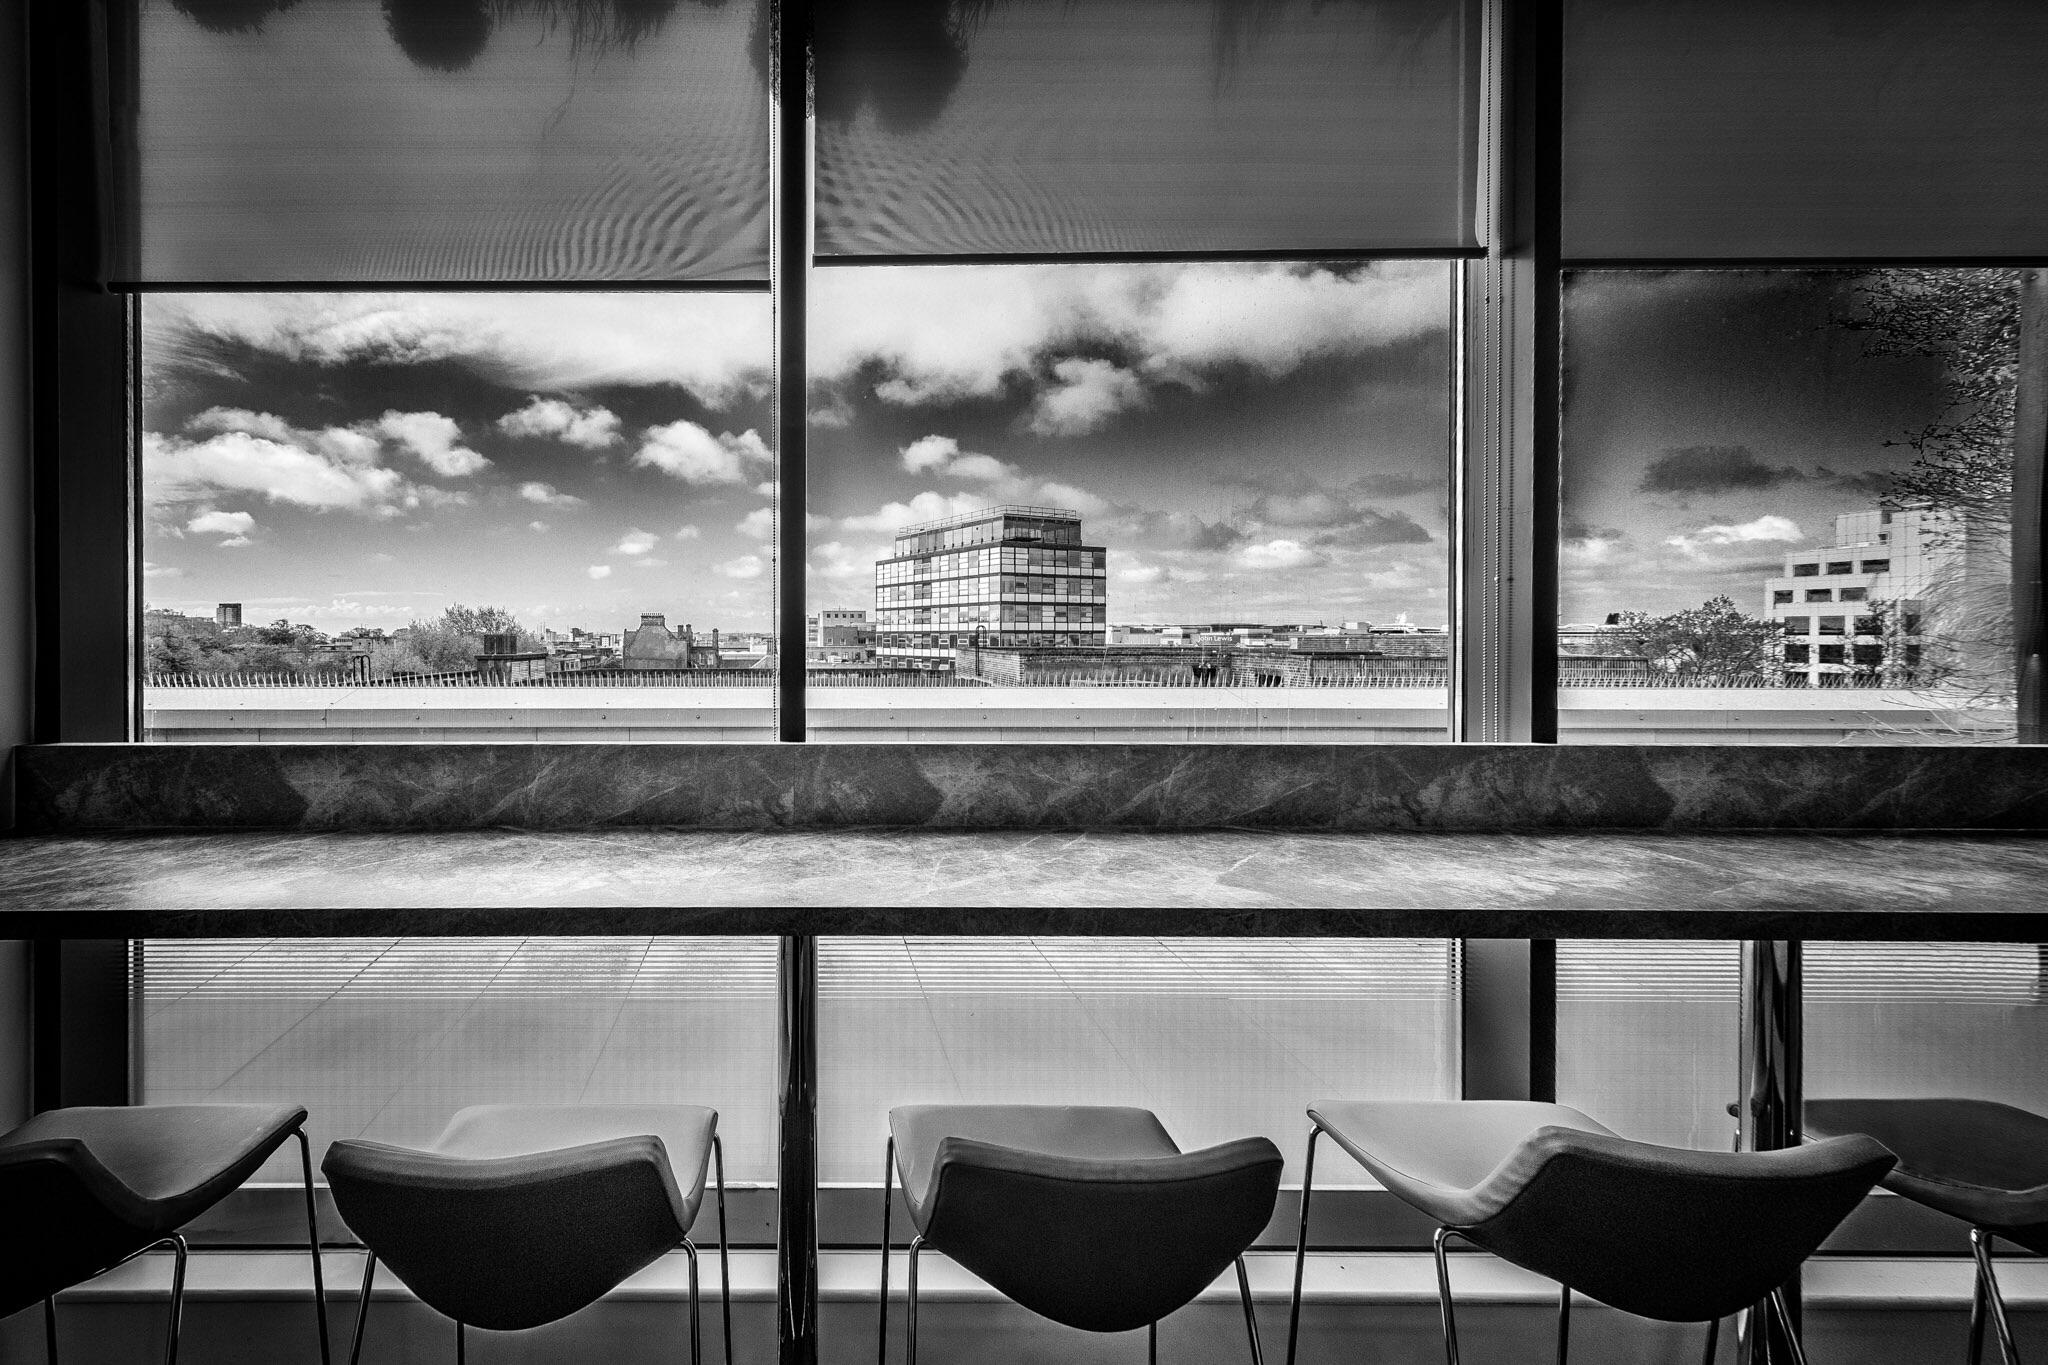 Seats at the University of Southampton